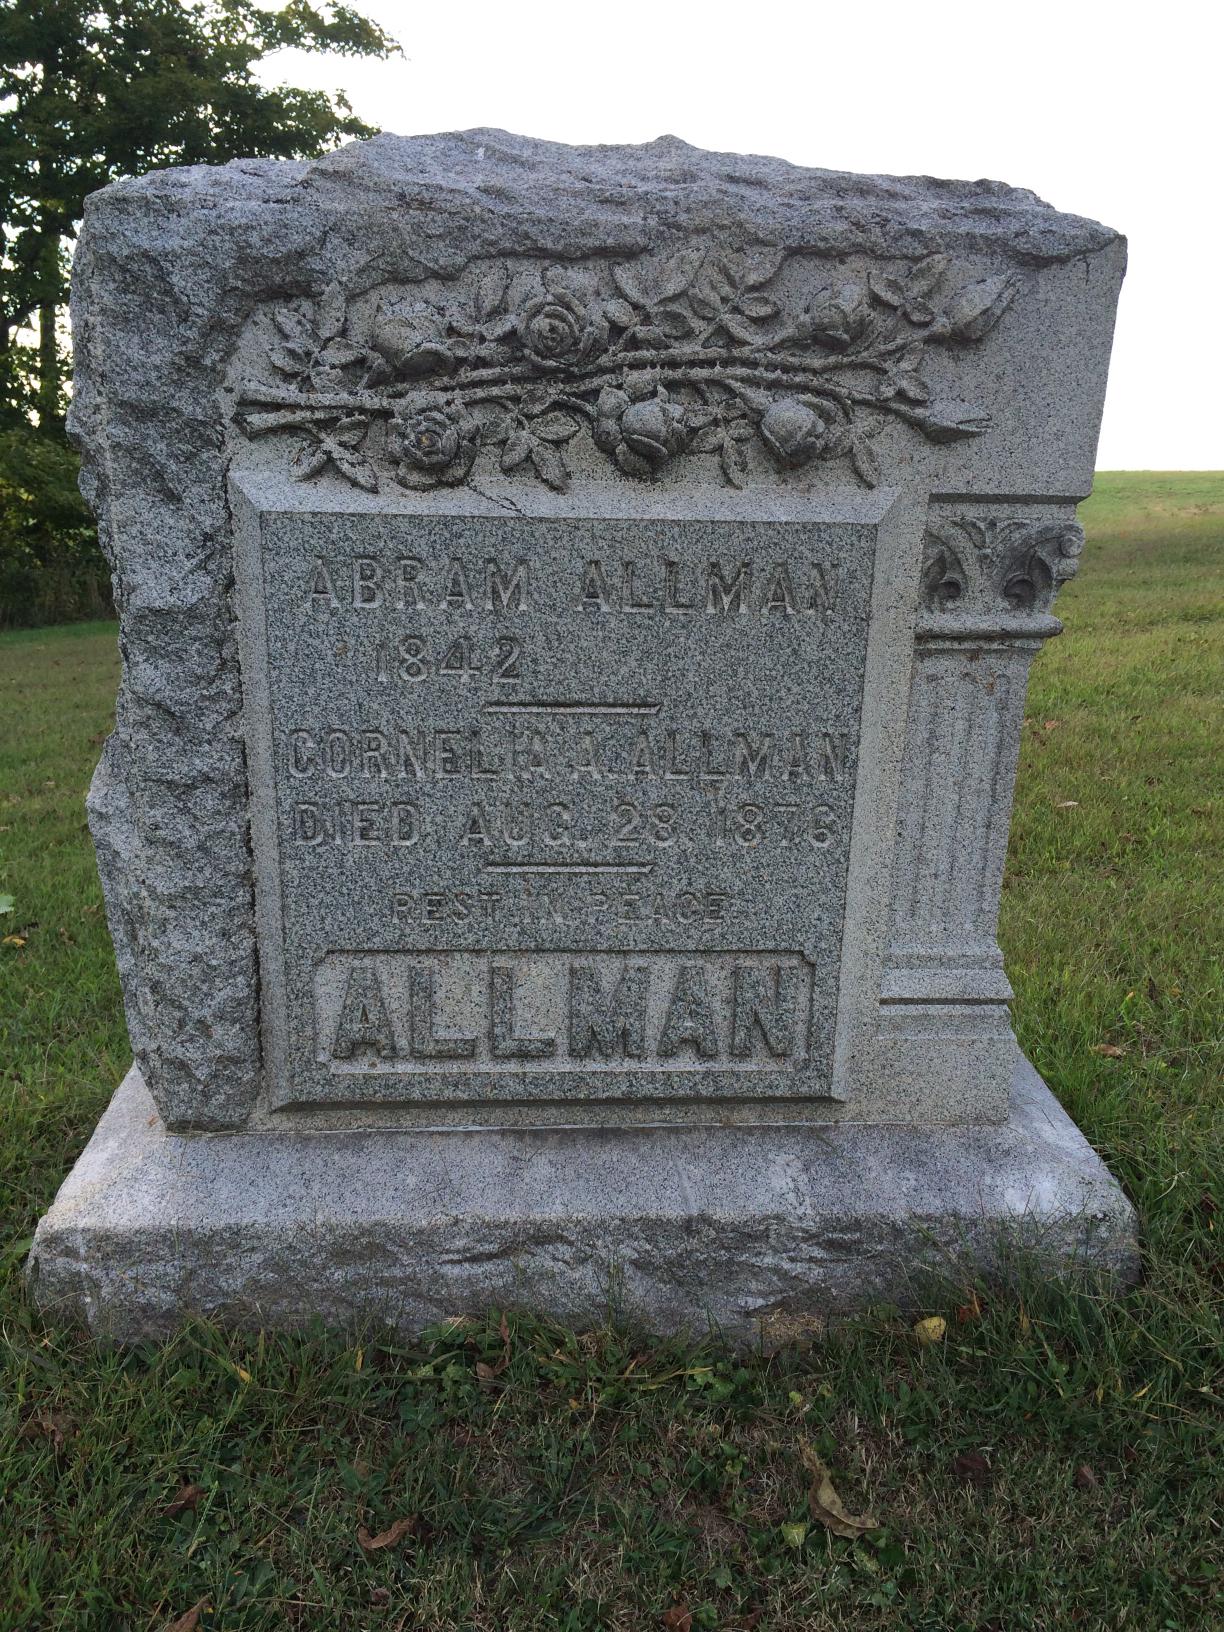 Abraham Allman